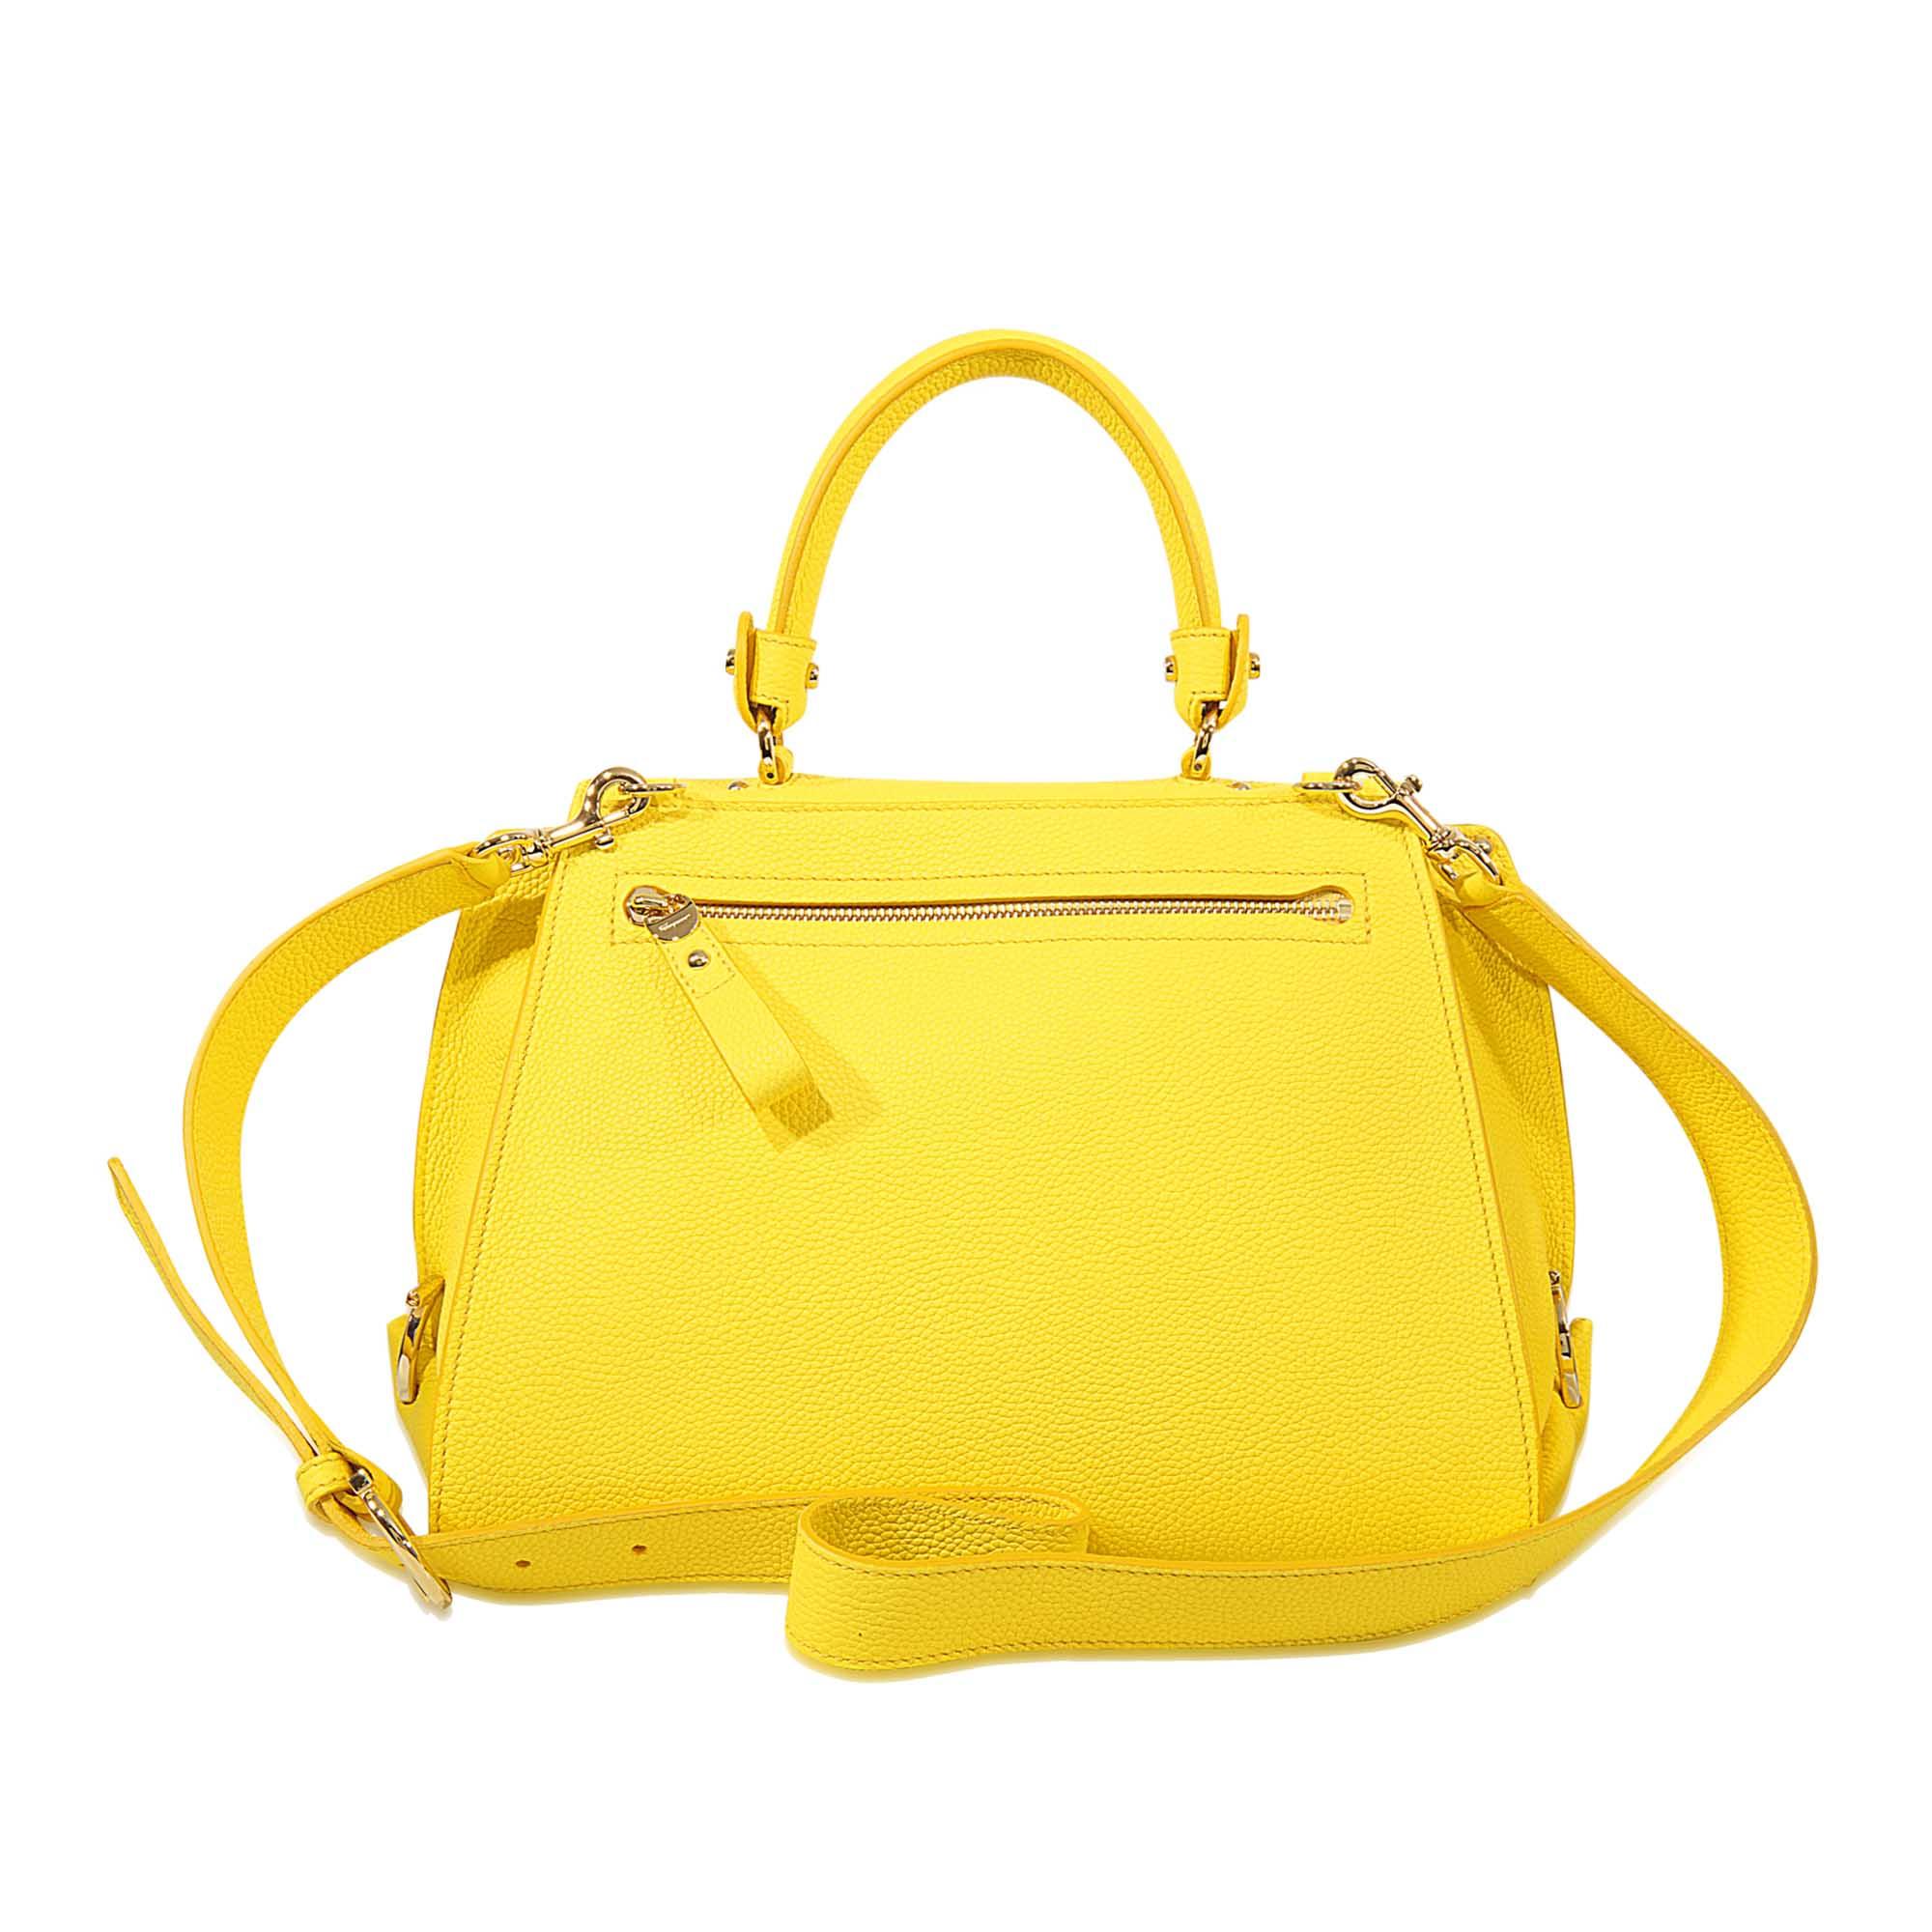 3d5c862e41 Lyst - Ferragamo Sofia Medium Top Handle Bag in Yellow